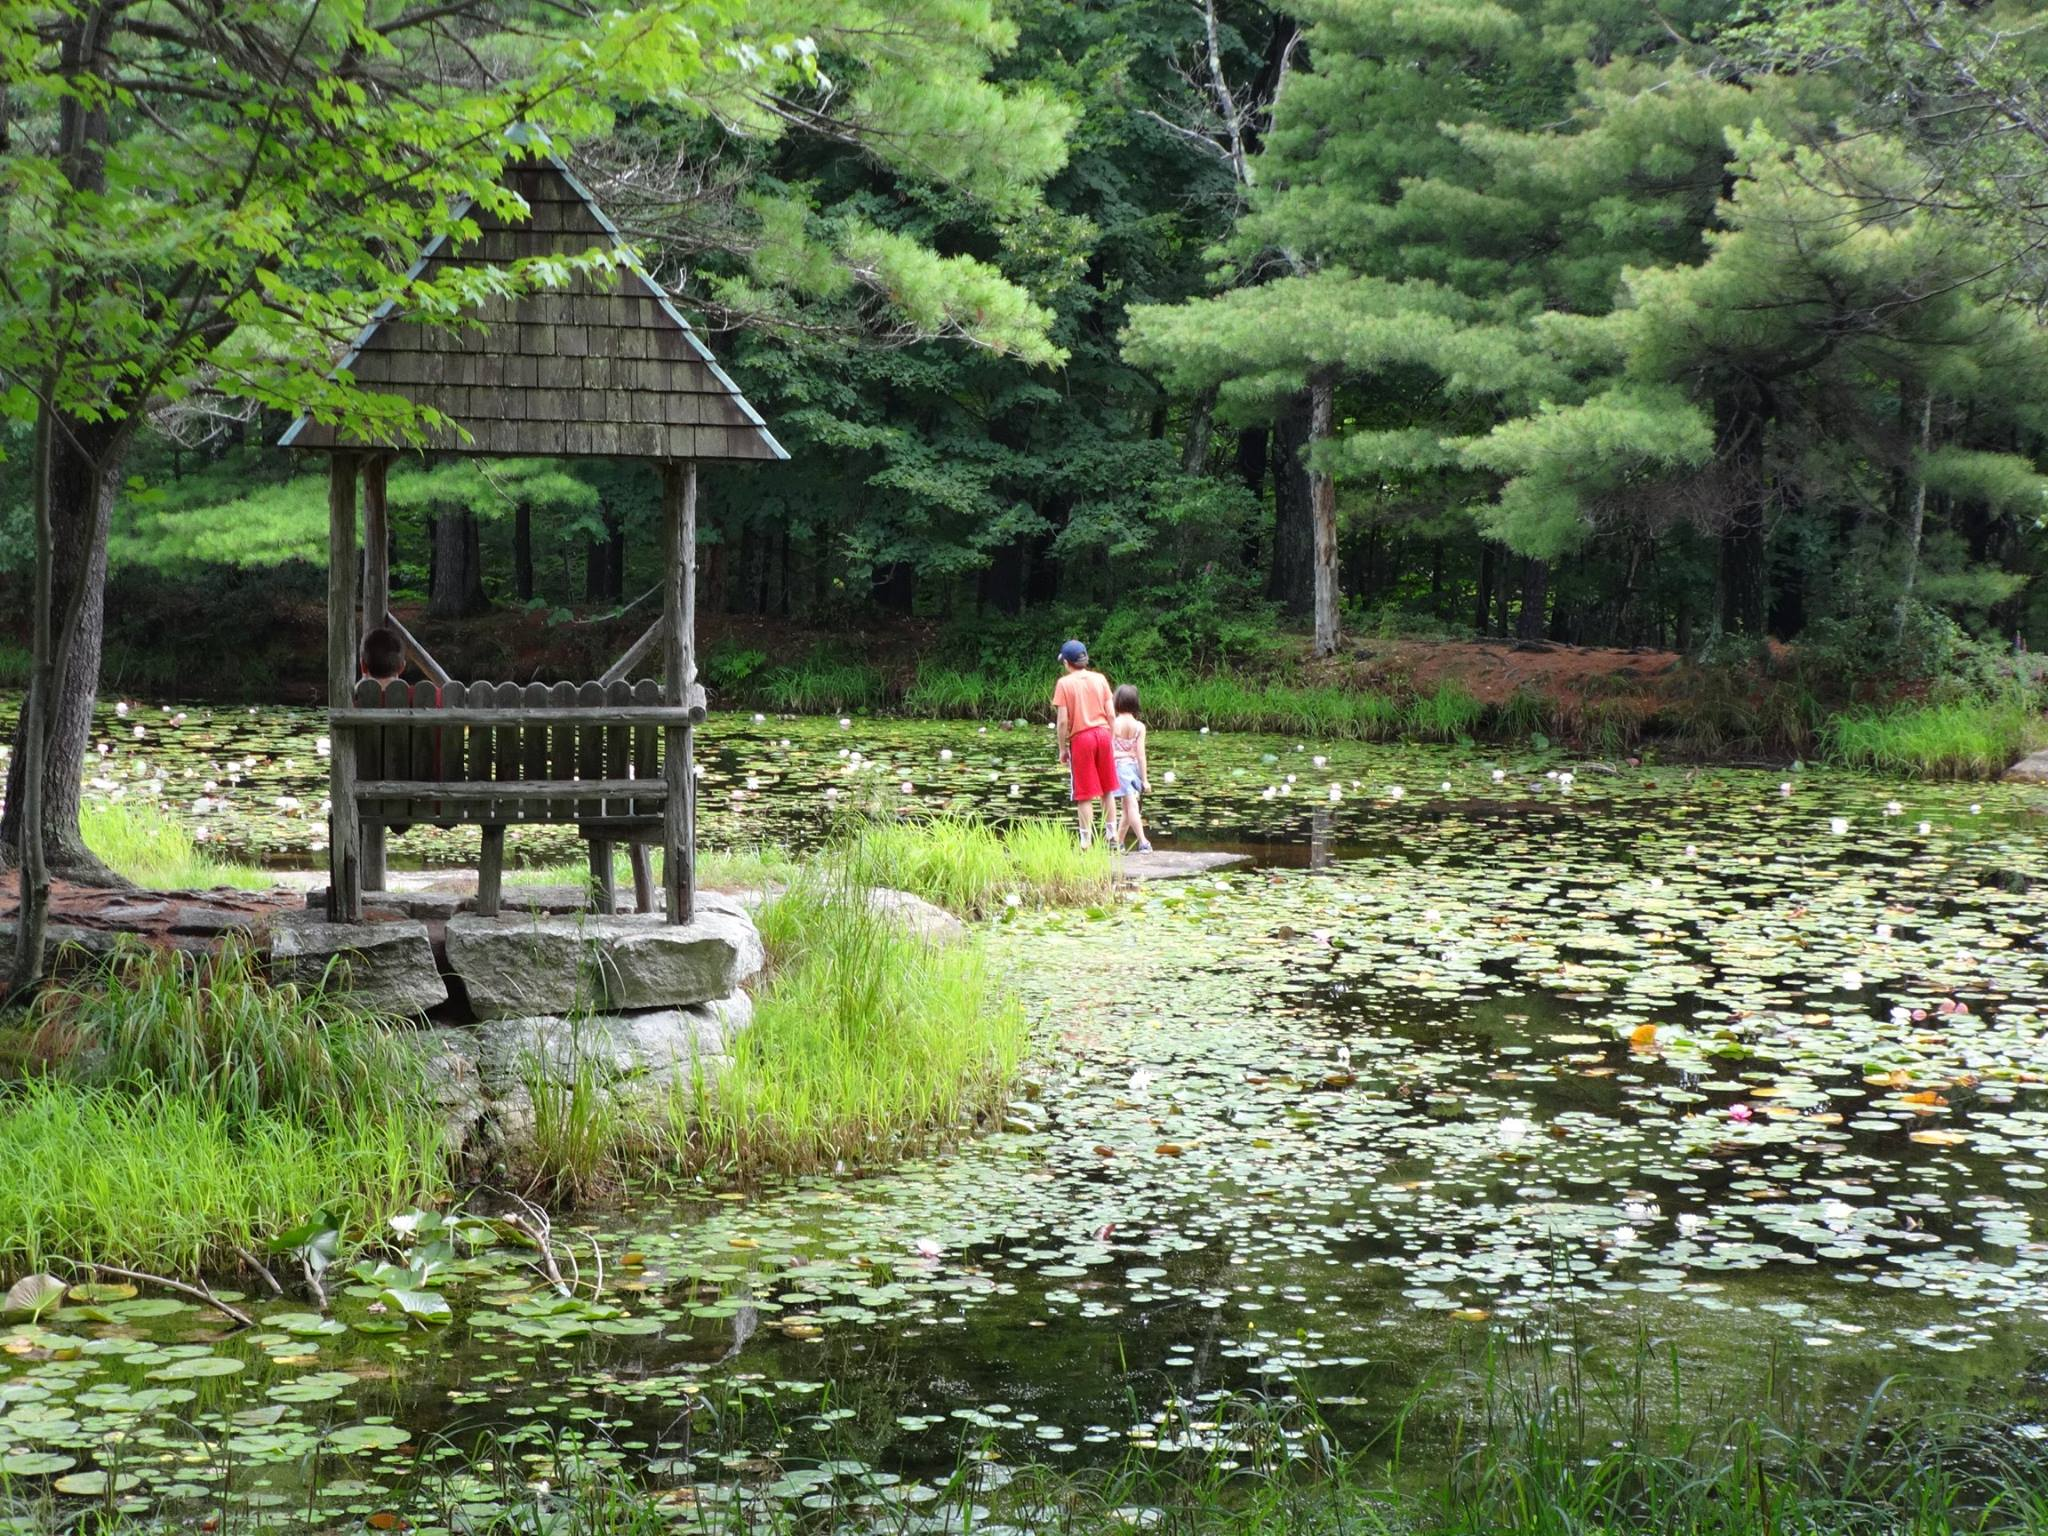 Exploring the Lily Pad Pond (Koehler Foisy photo)